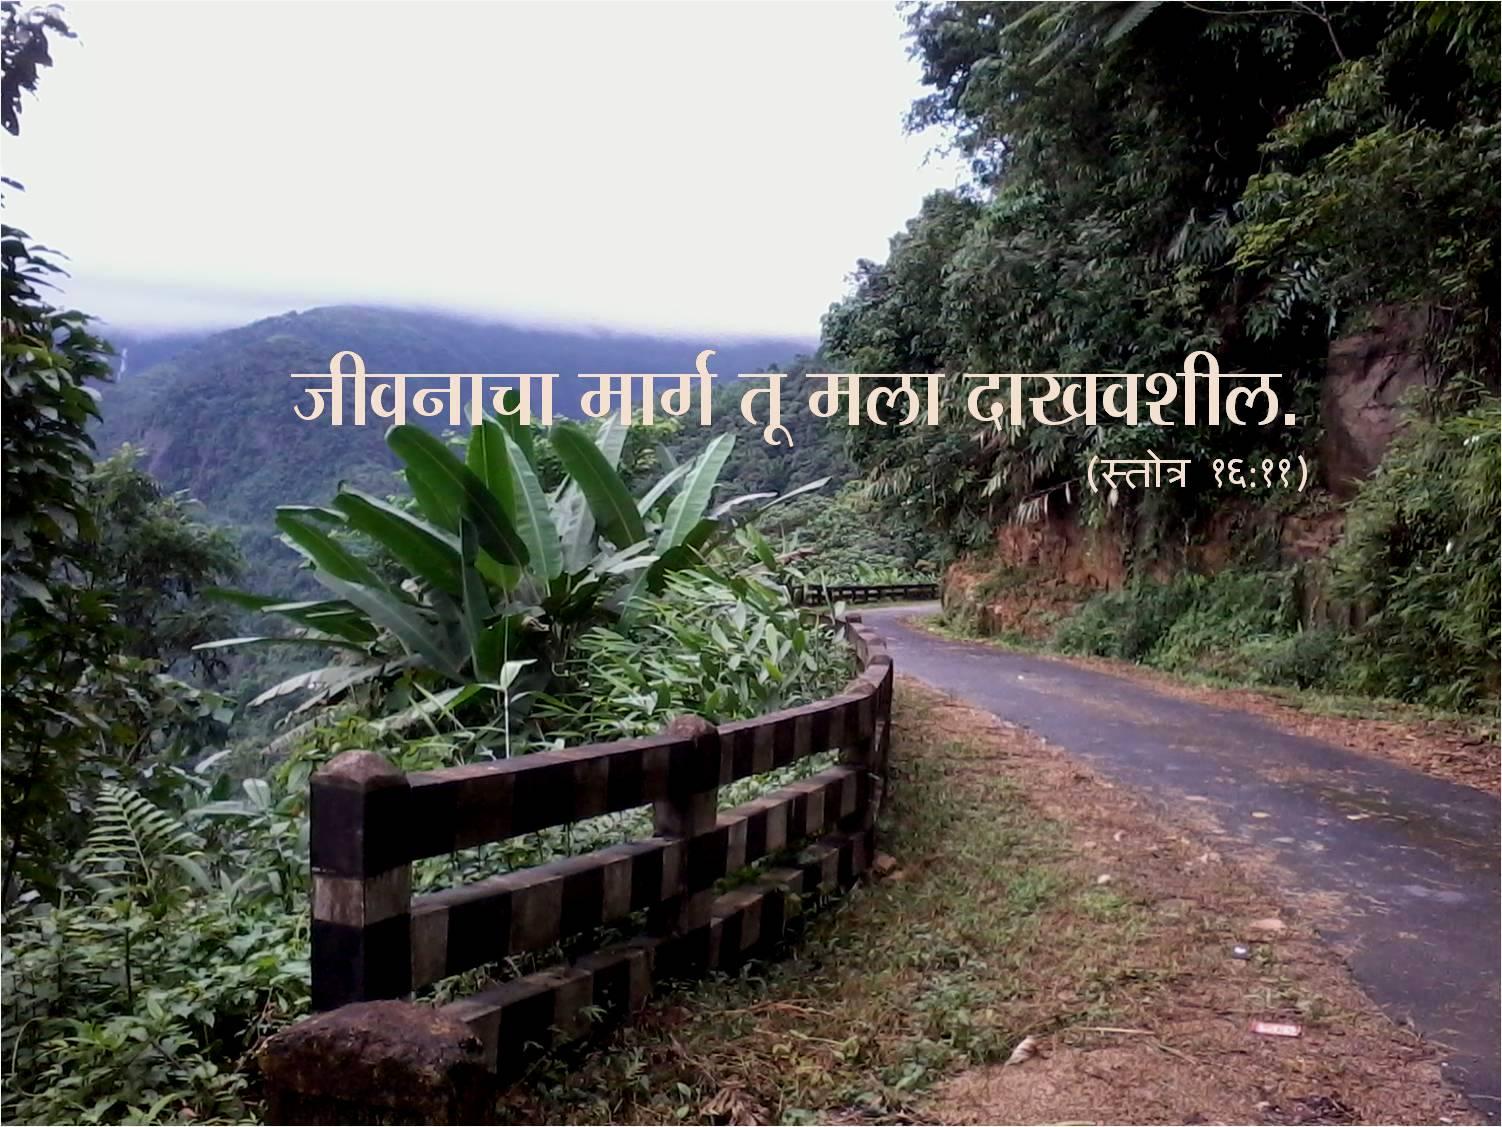 marathi bible wallpaper for - photo #34